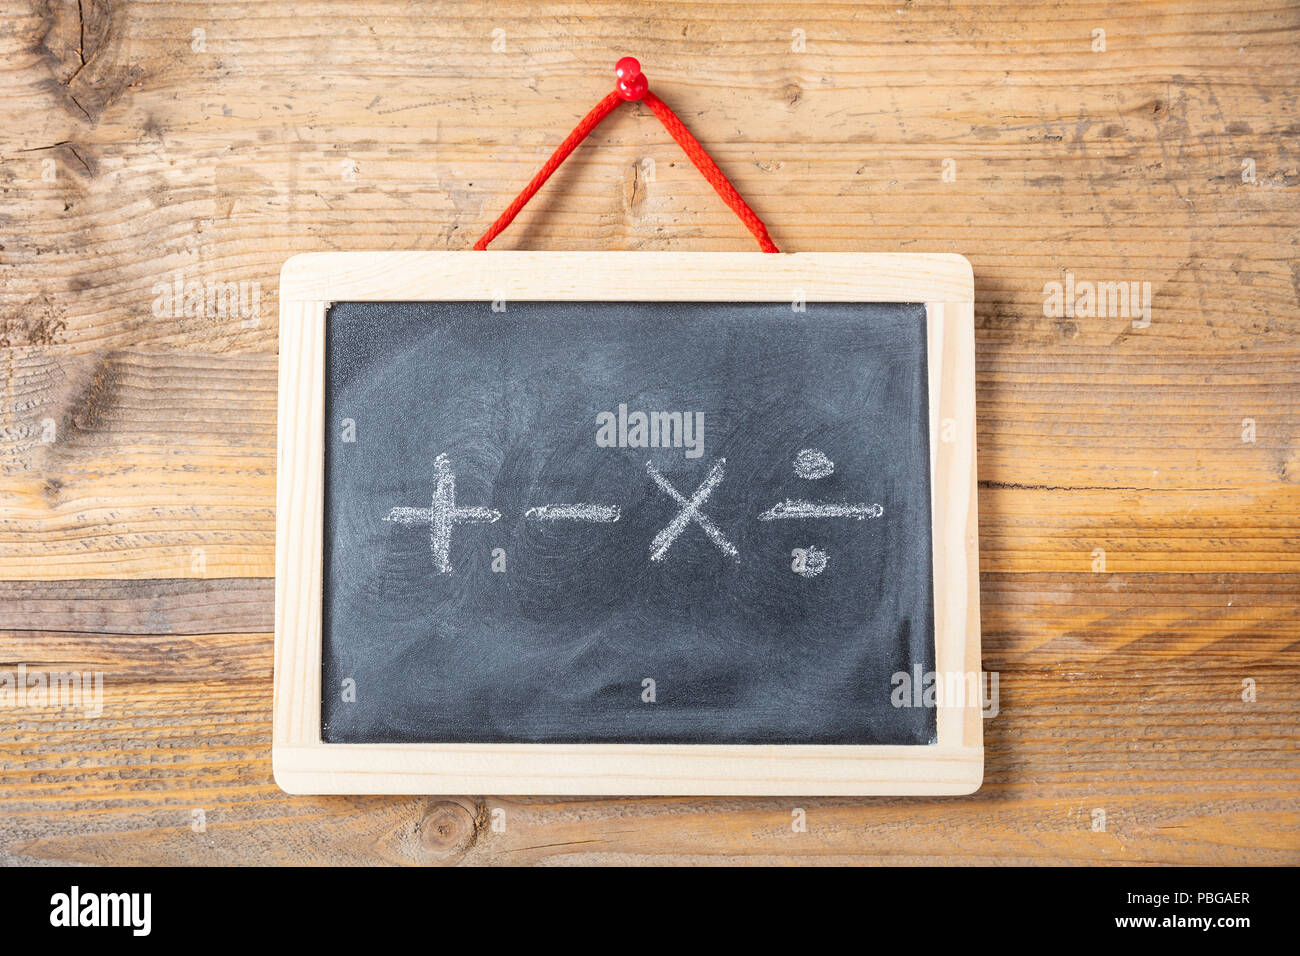 Math Symbols Stockfotos & Math Symbols Bilder - Alamy